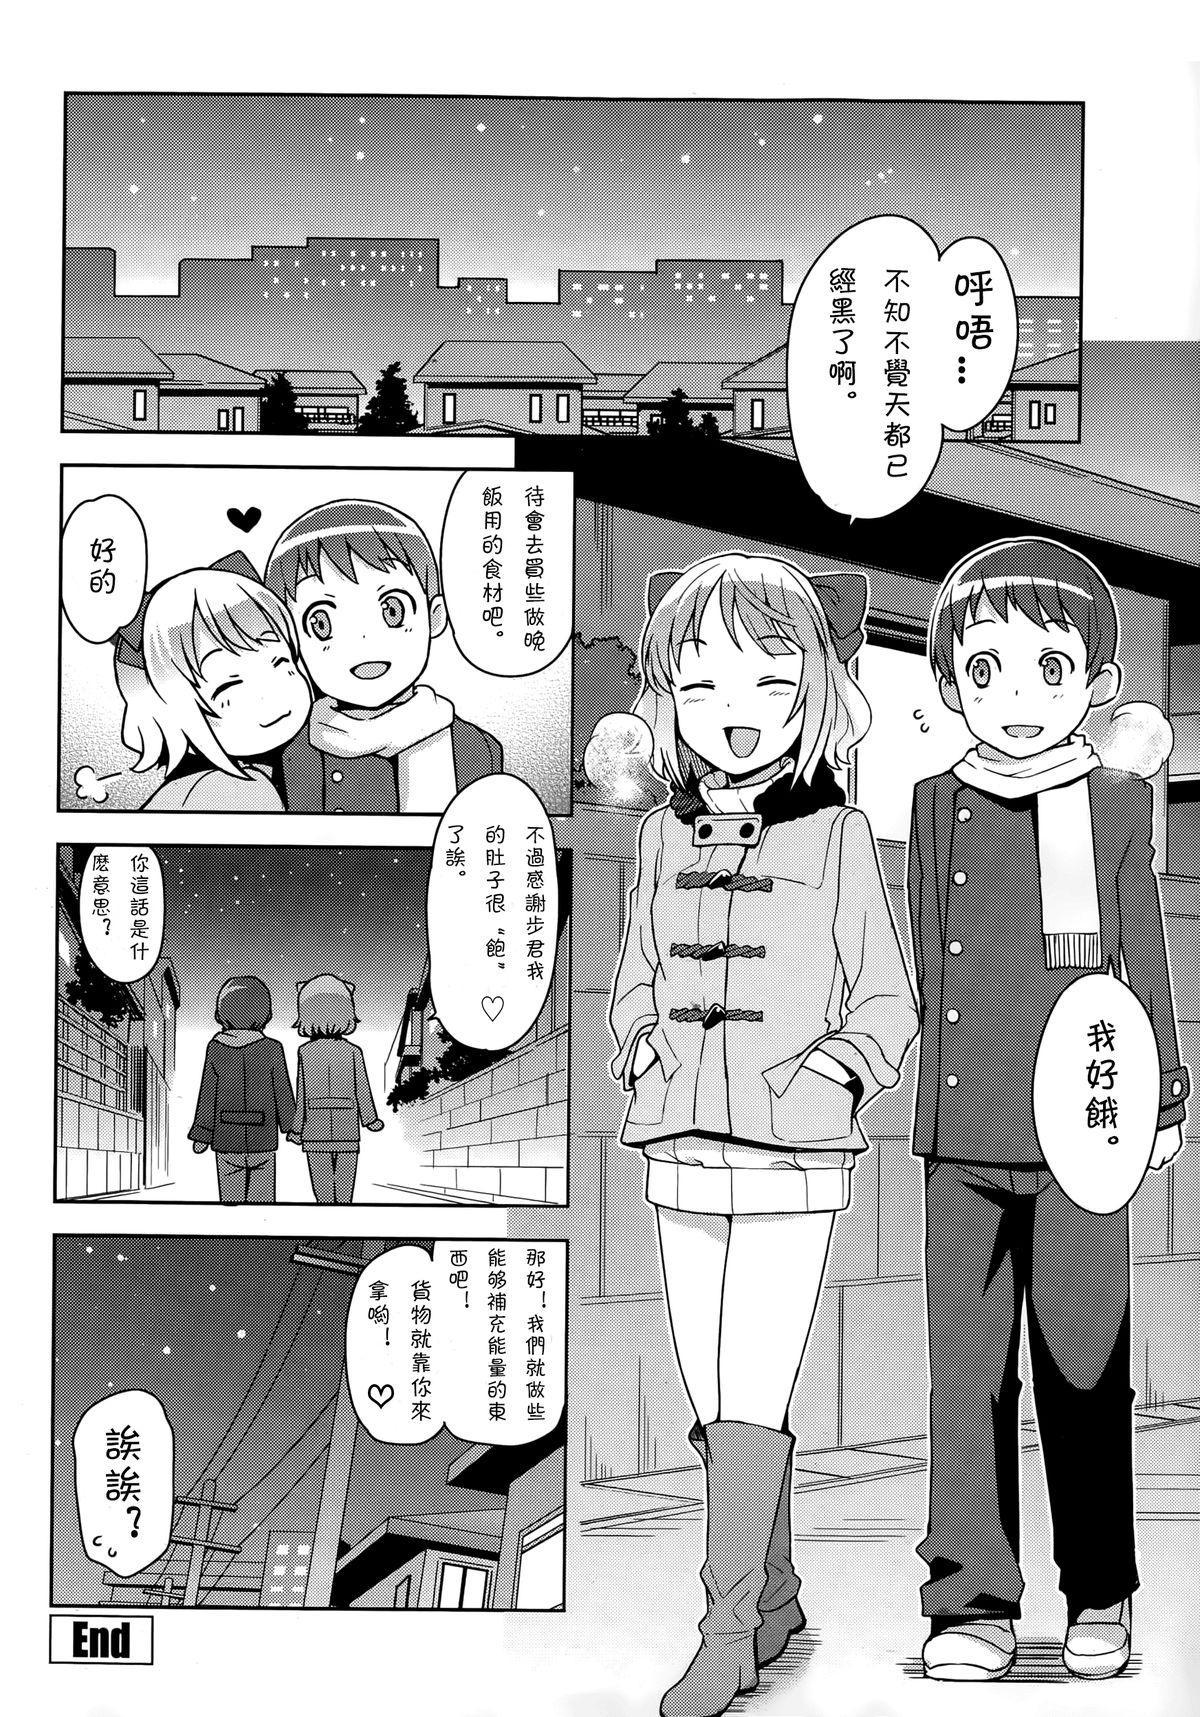 Watashi ga Suki na Aitsu no xxx | Having XXX with the one I love Ch. 1-2 39